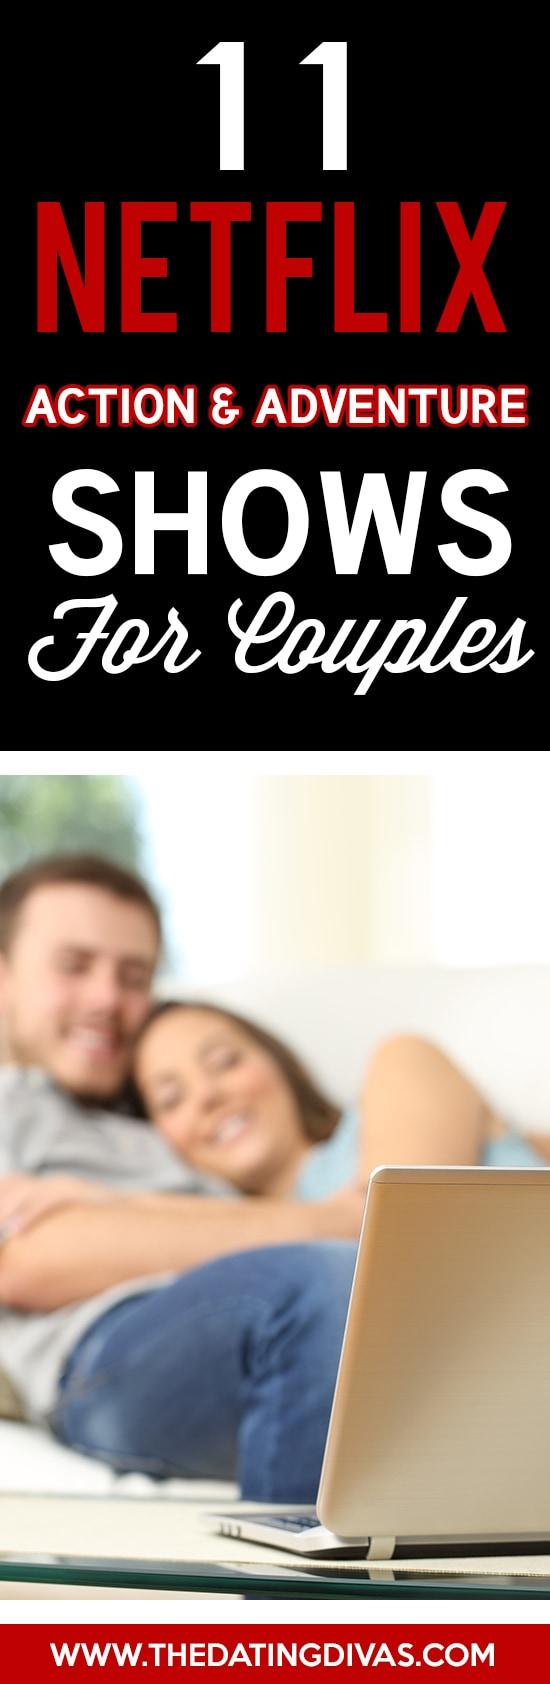 11 Action & Adventure Netflix Shows for Couples